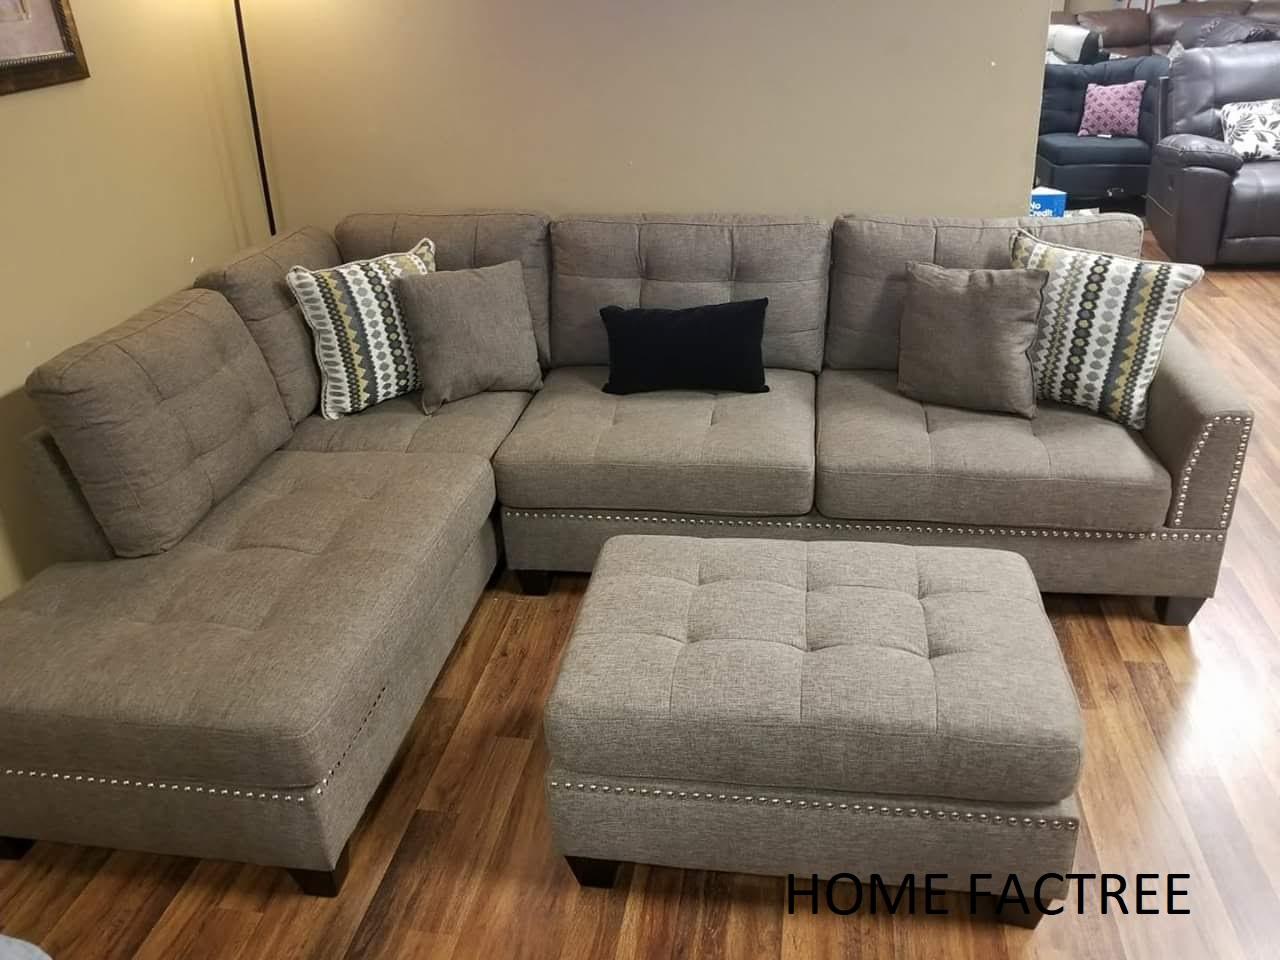 Maison Corner Sofa Home Factree